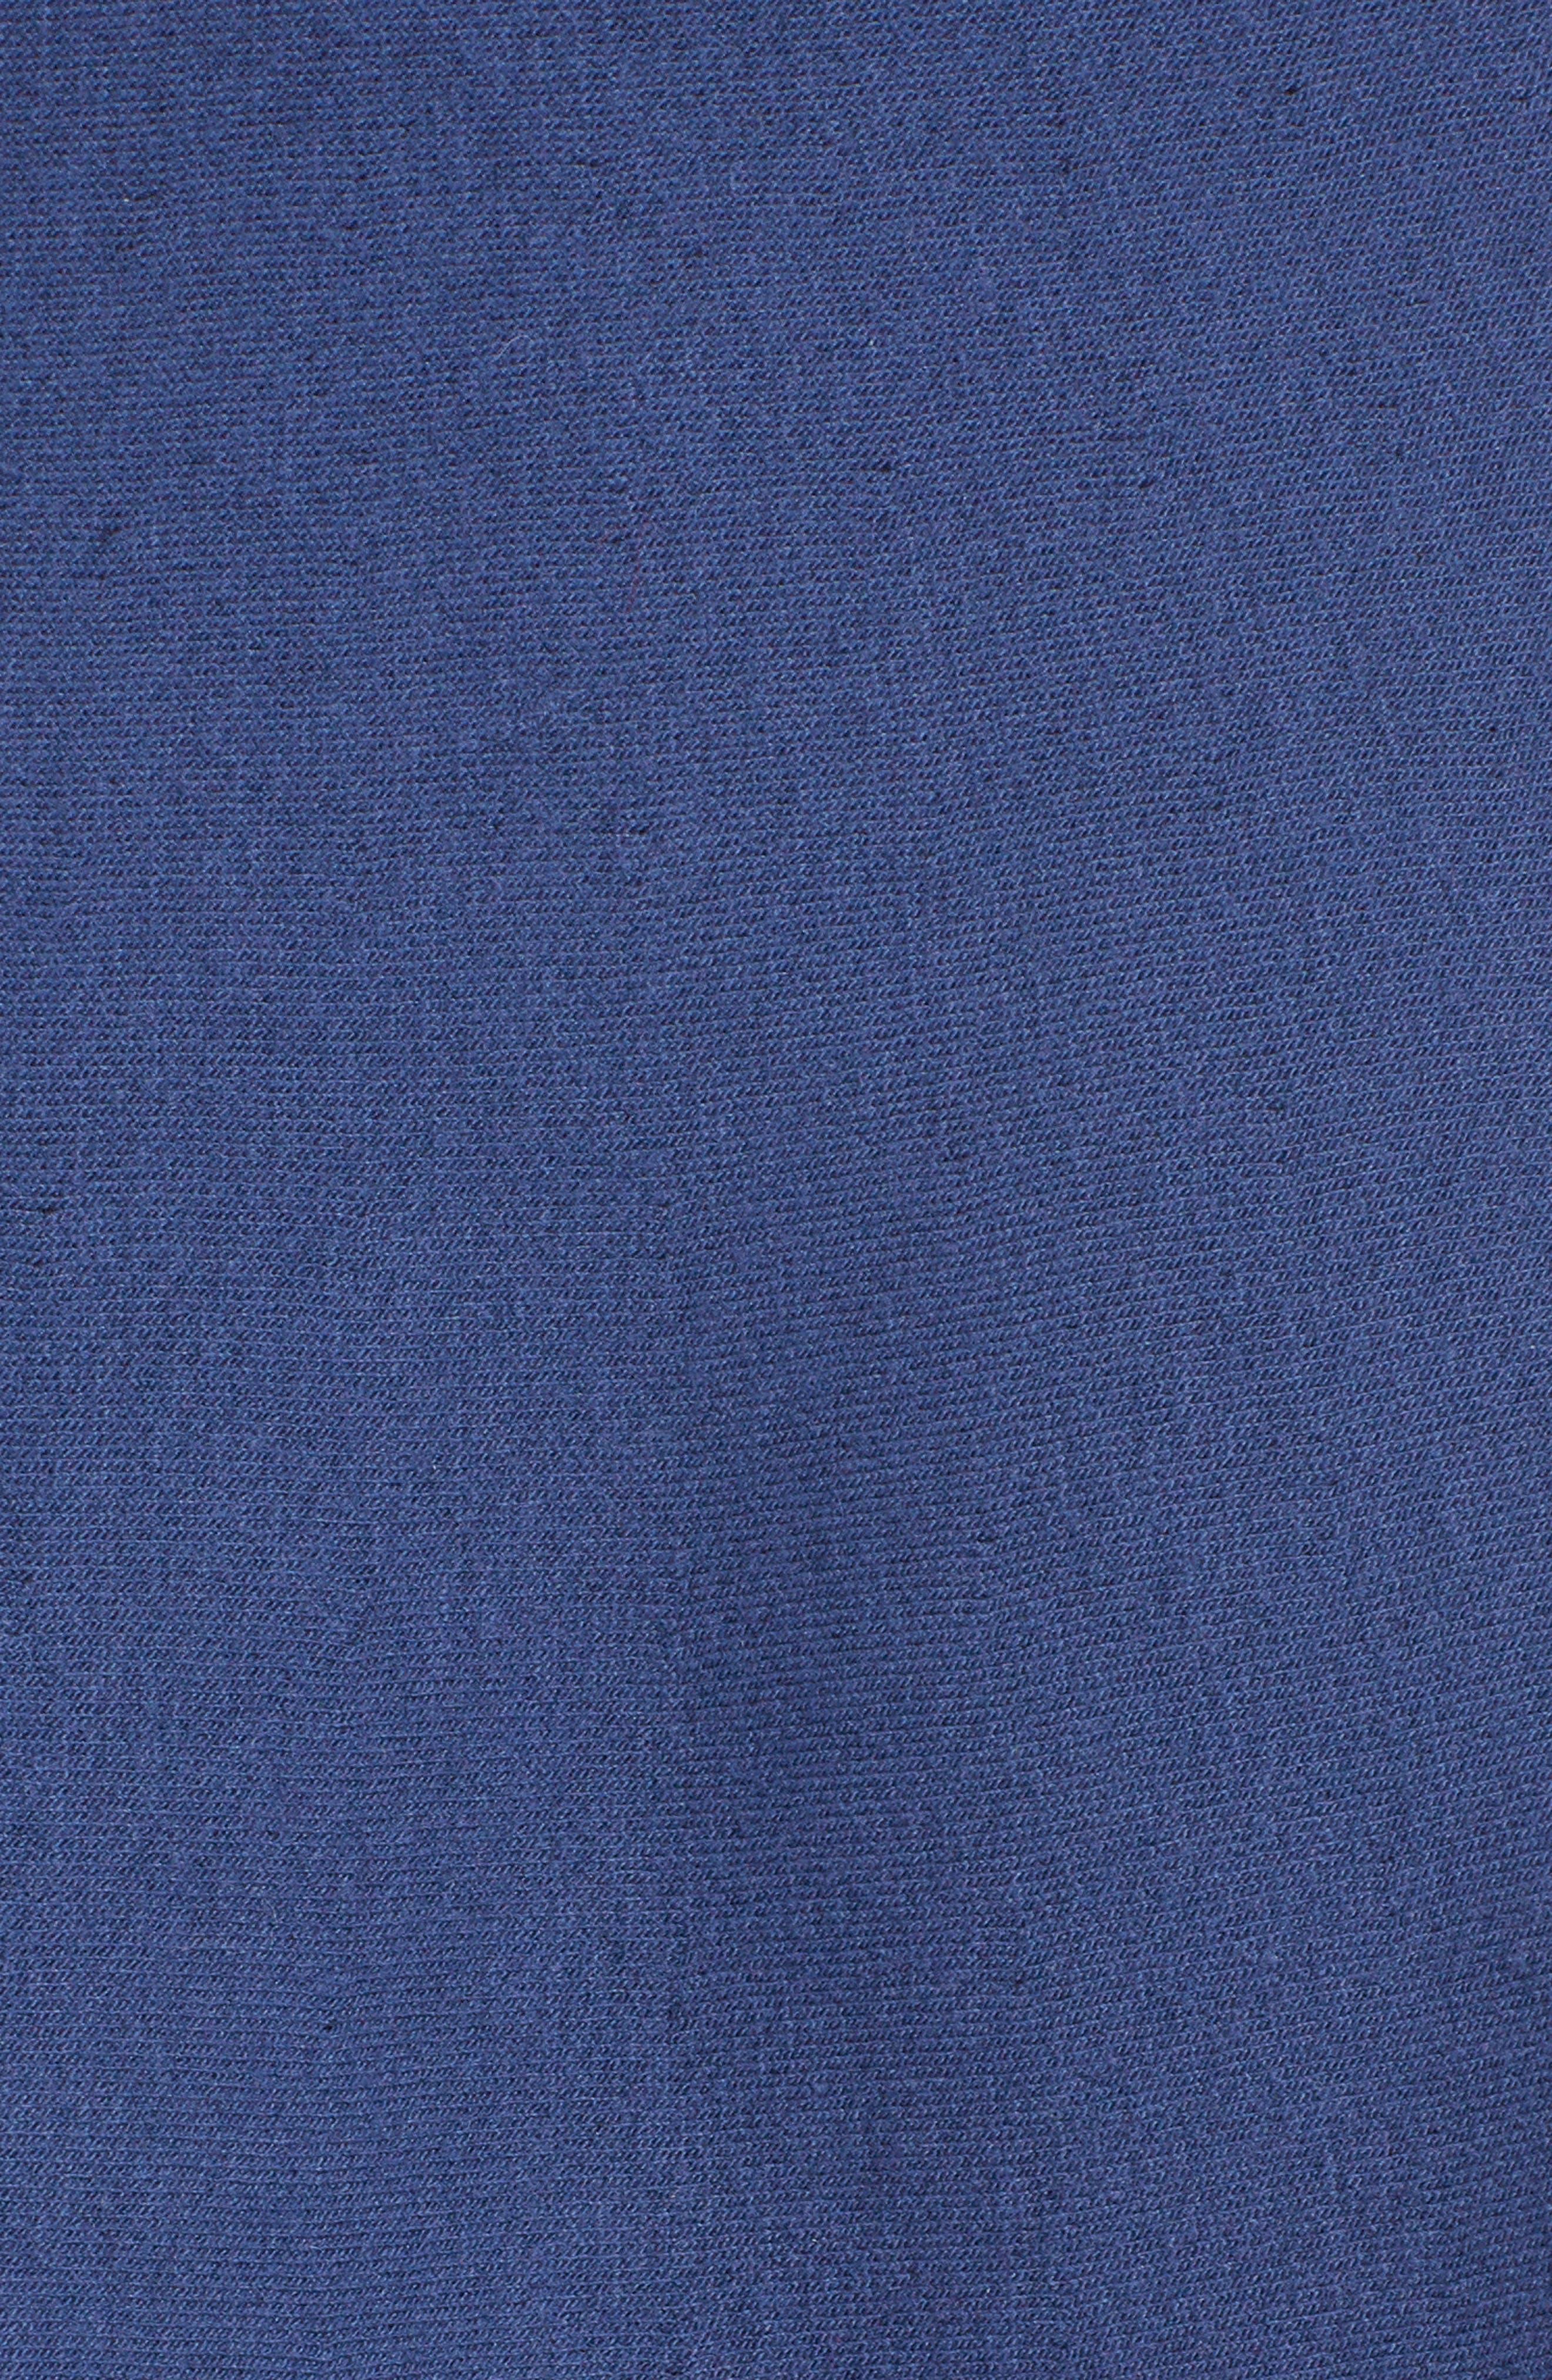 Cutout Heart Reversible Fit & Flare Dress,                             Alternate thumbnail 5, color,                             BLUE